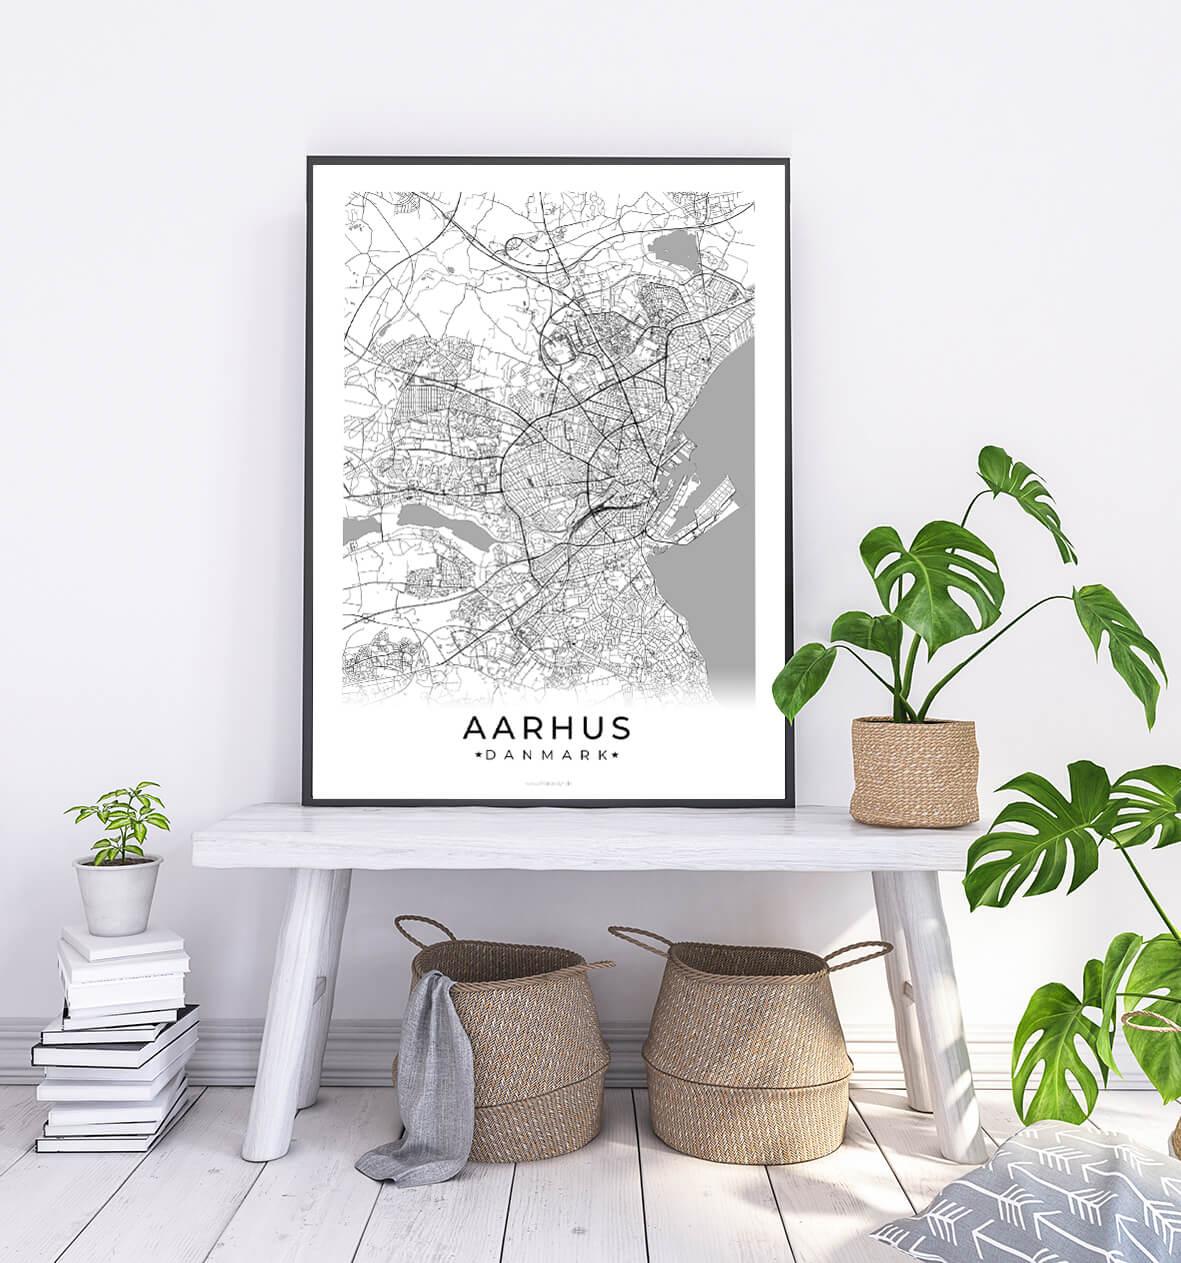 Aarhus-hvid-byplakat-1